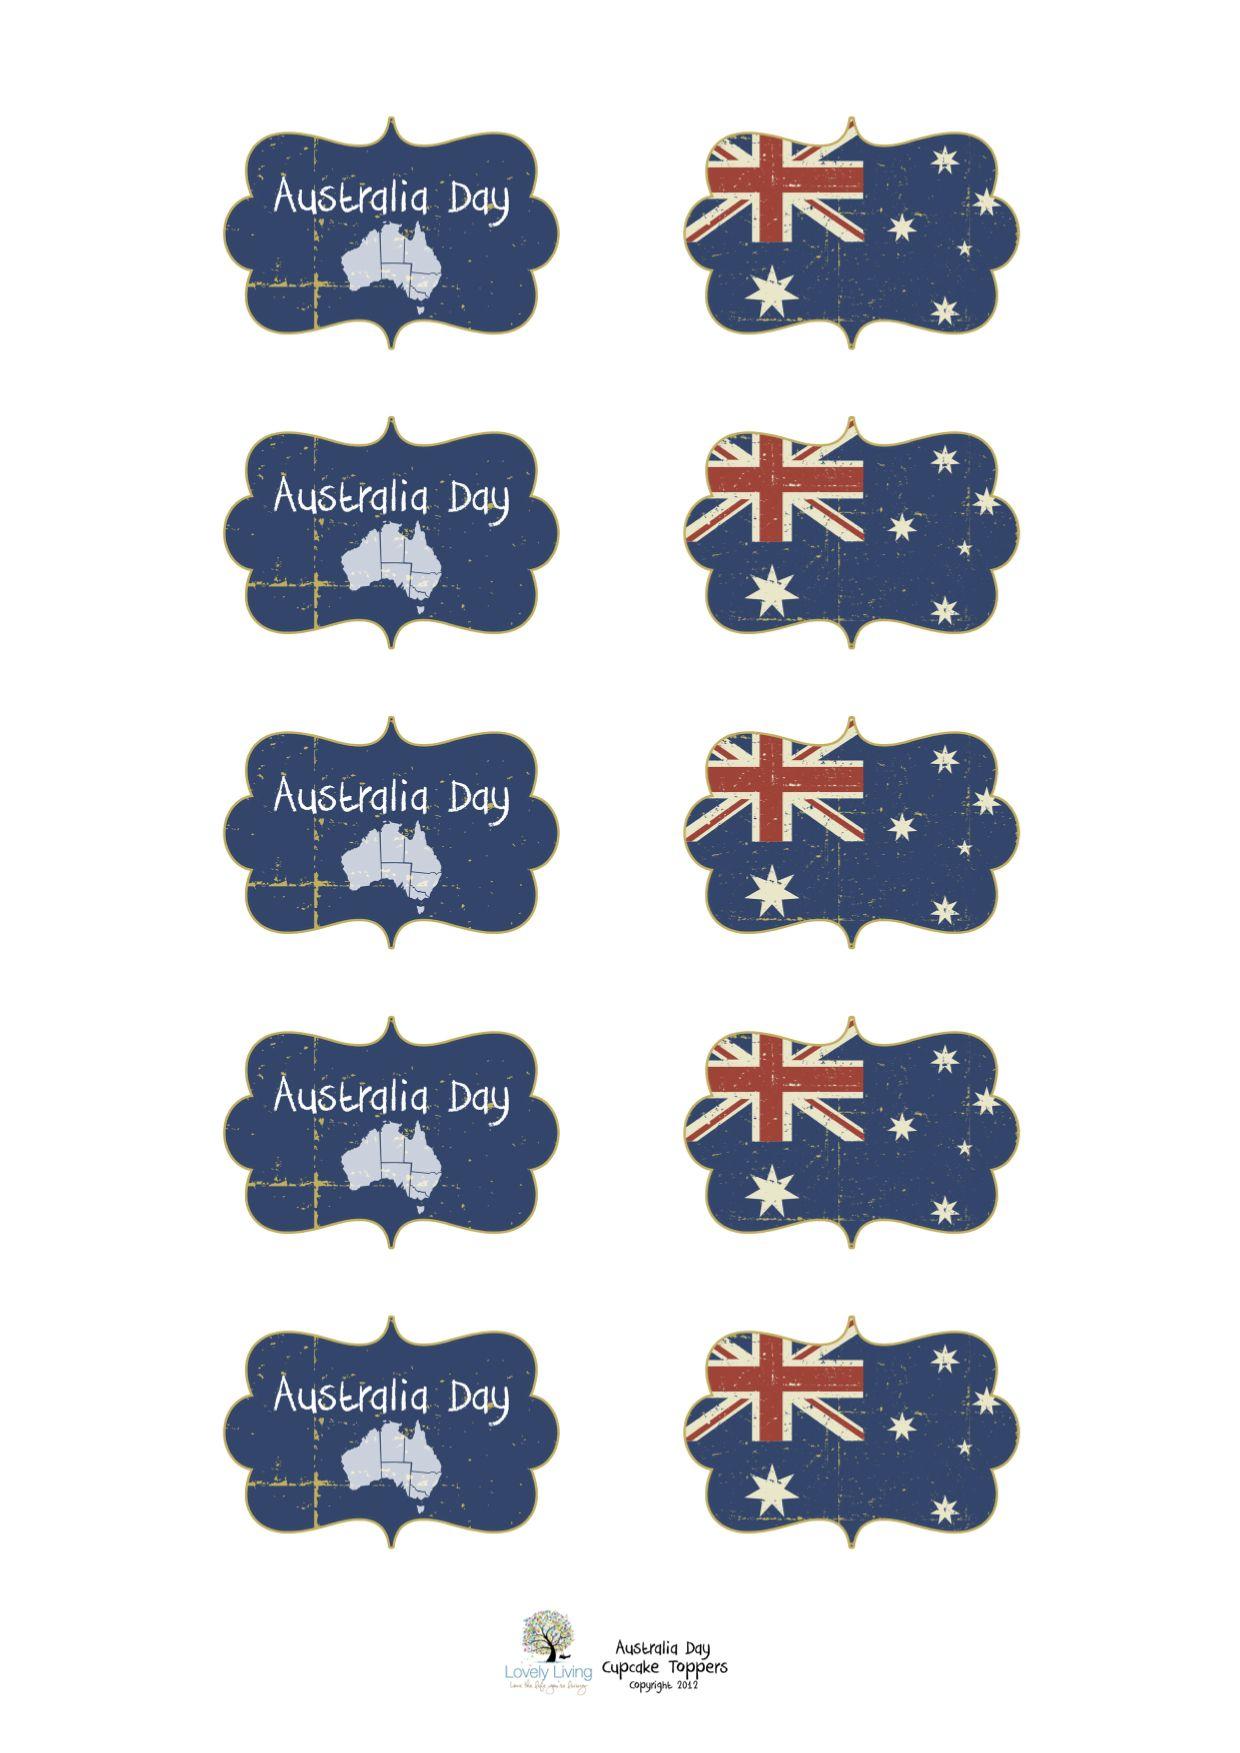 24 australia flag australia day ozzy flag cupcake toppers  party edible paper